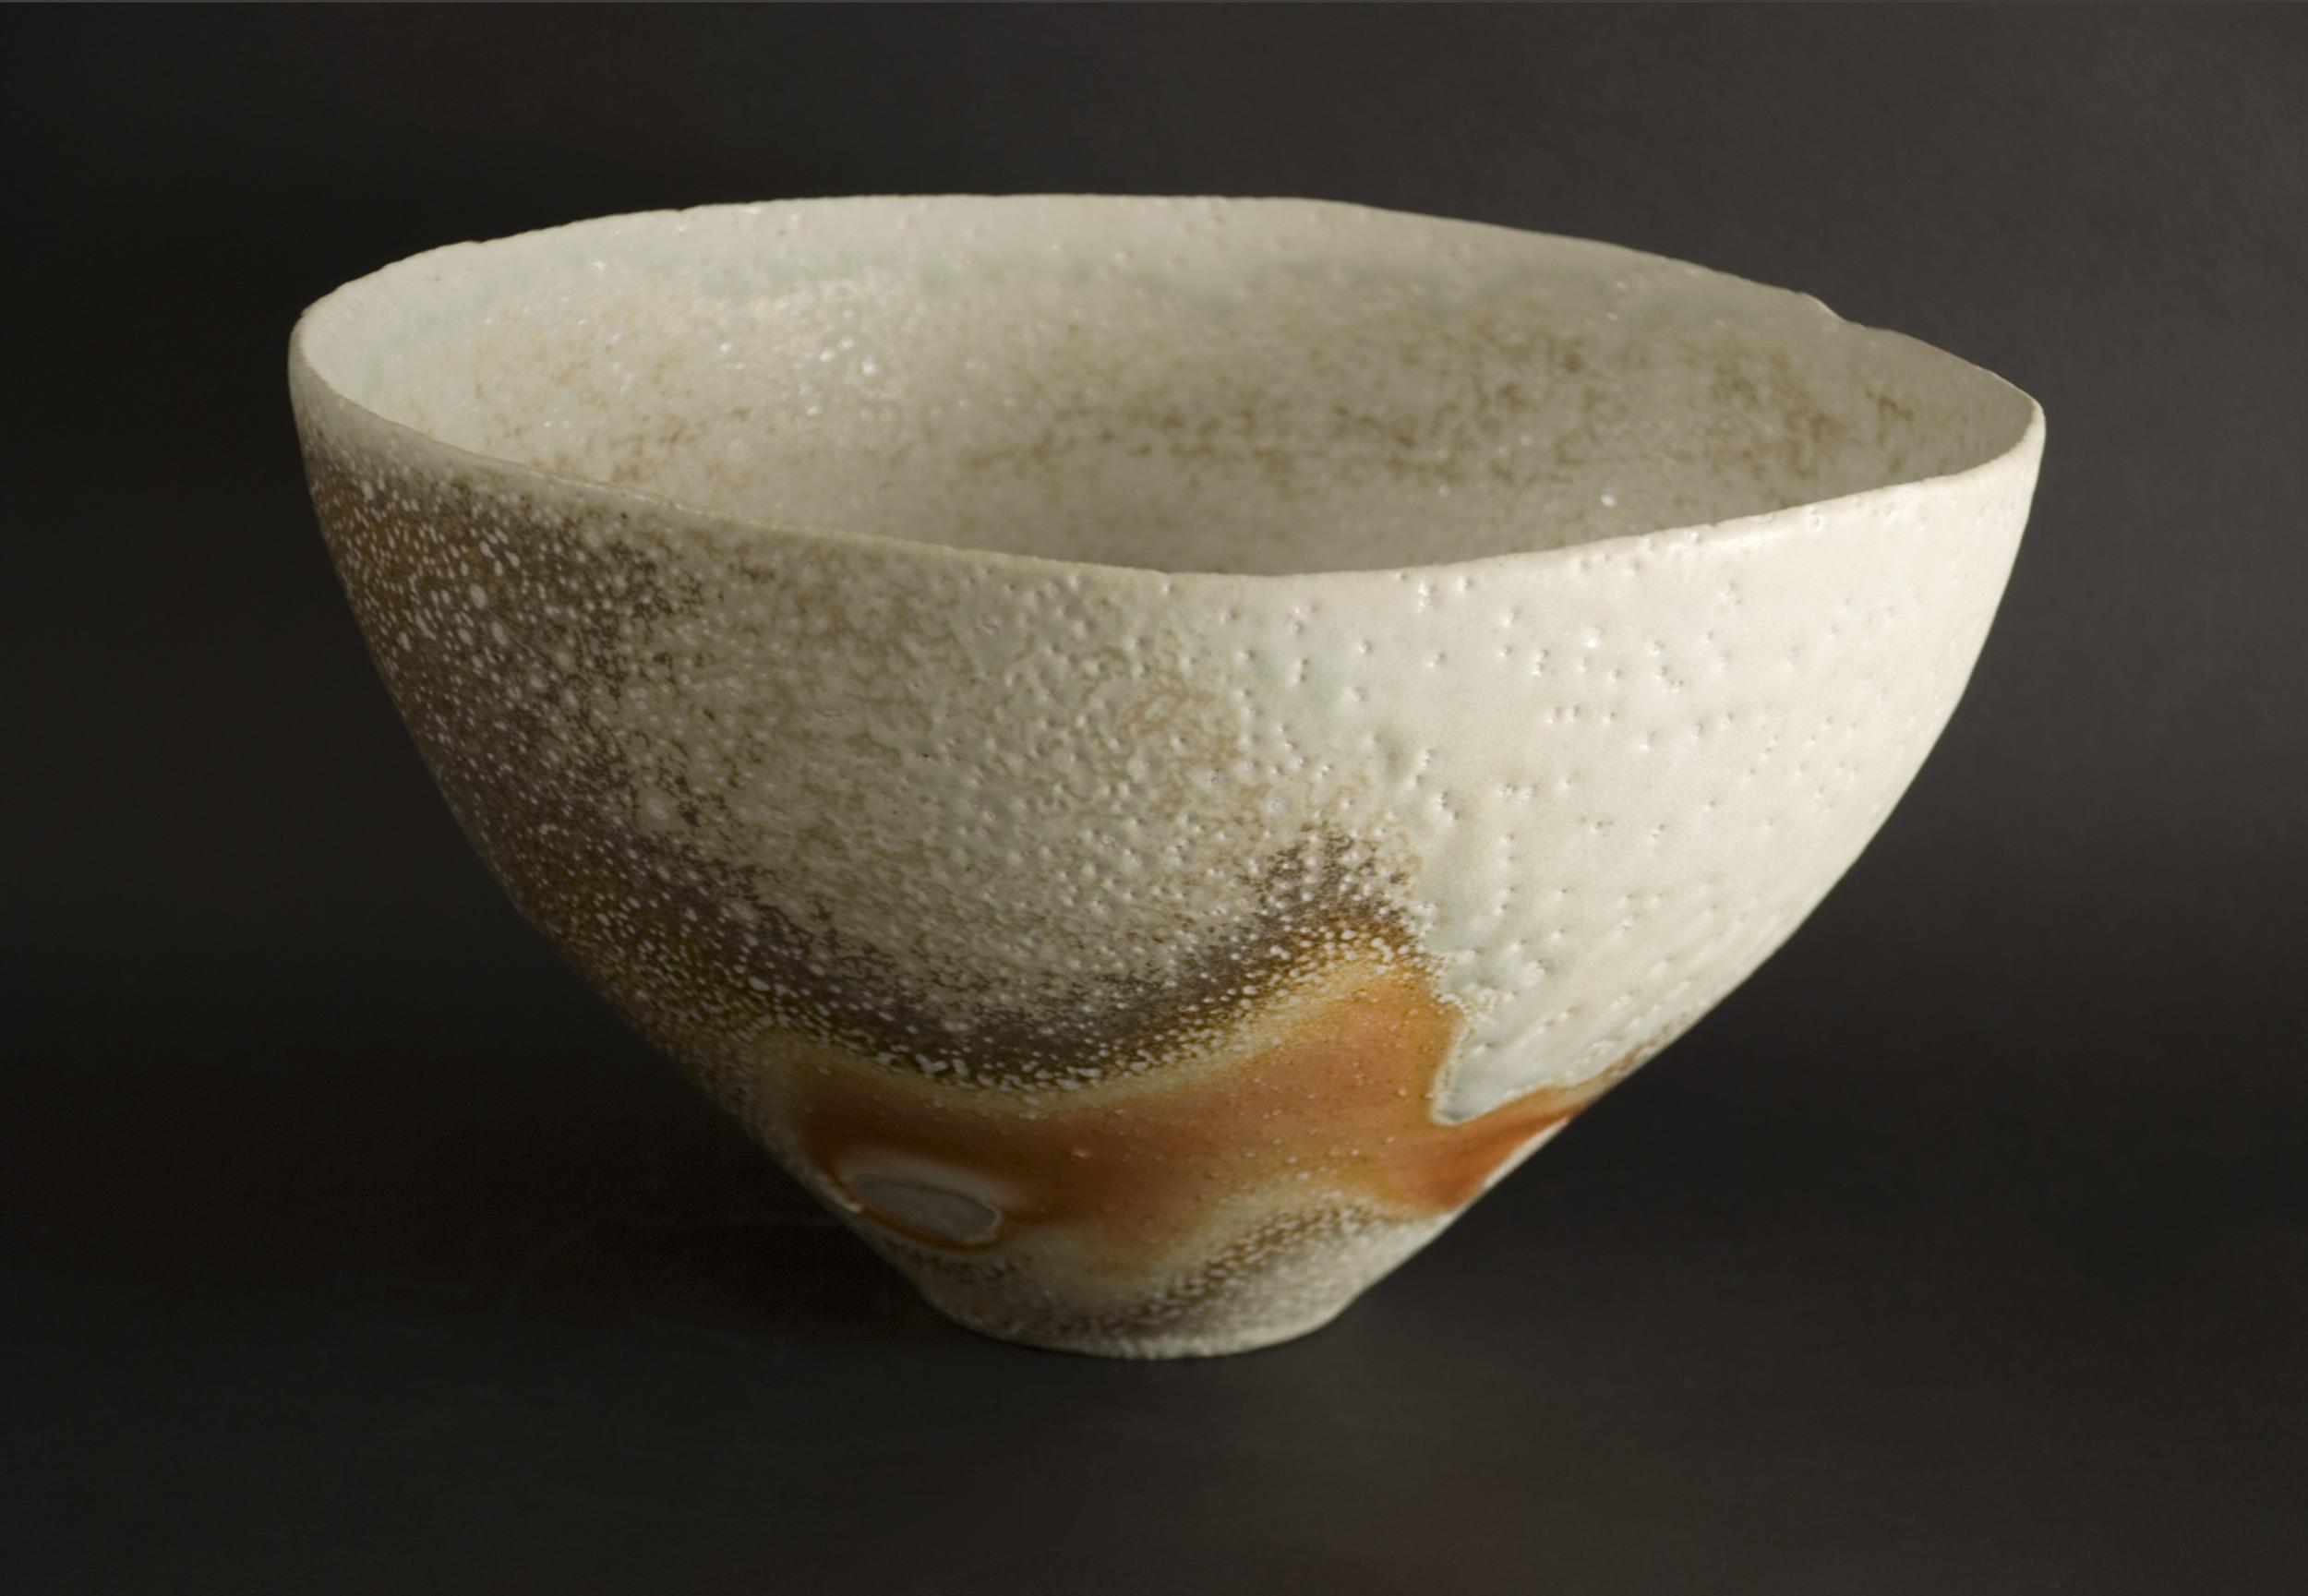 Gail Nichols    Ice Bowl  , 2008 Stoneware, soda vapor glaze 7 x 12.25 x 11.75 inches / 17.8 x 31.1 x 29.8 cm / GAN 20